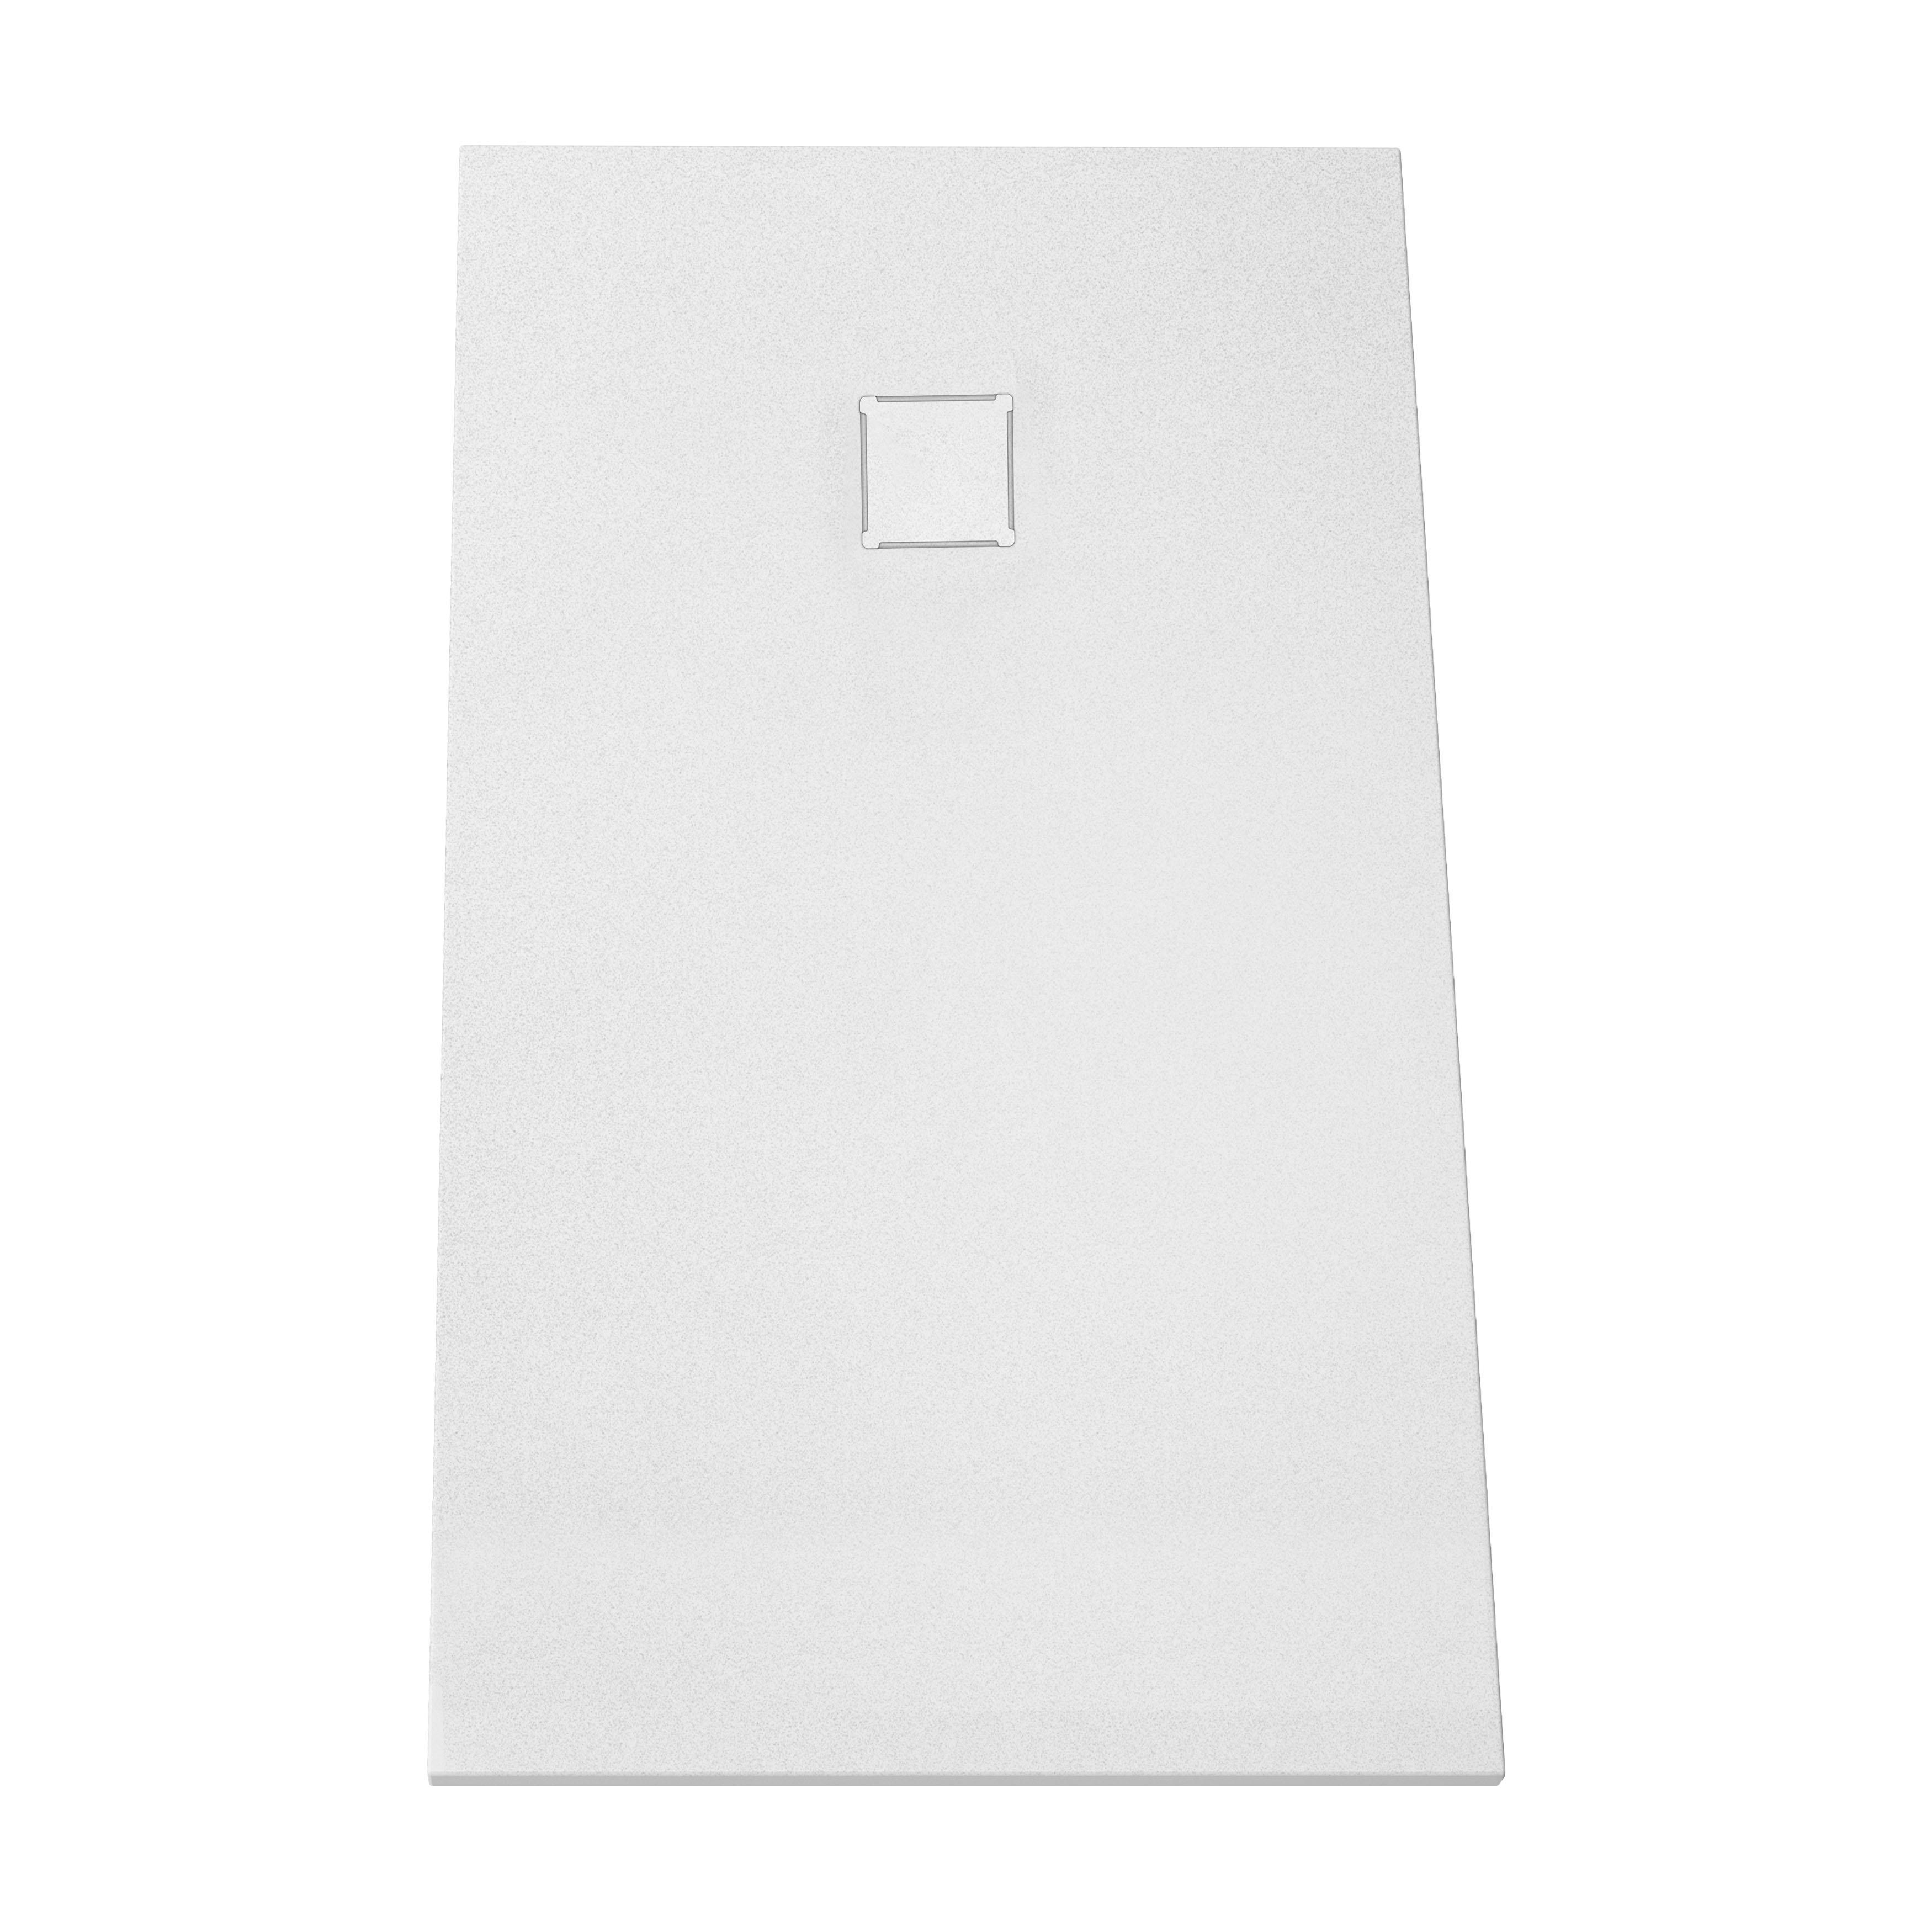 V-stone, receveur ultra plat en solid stone, 140  x  80 cm, blanc